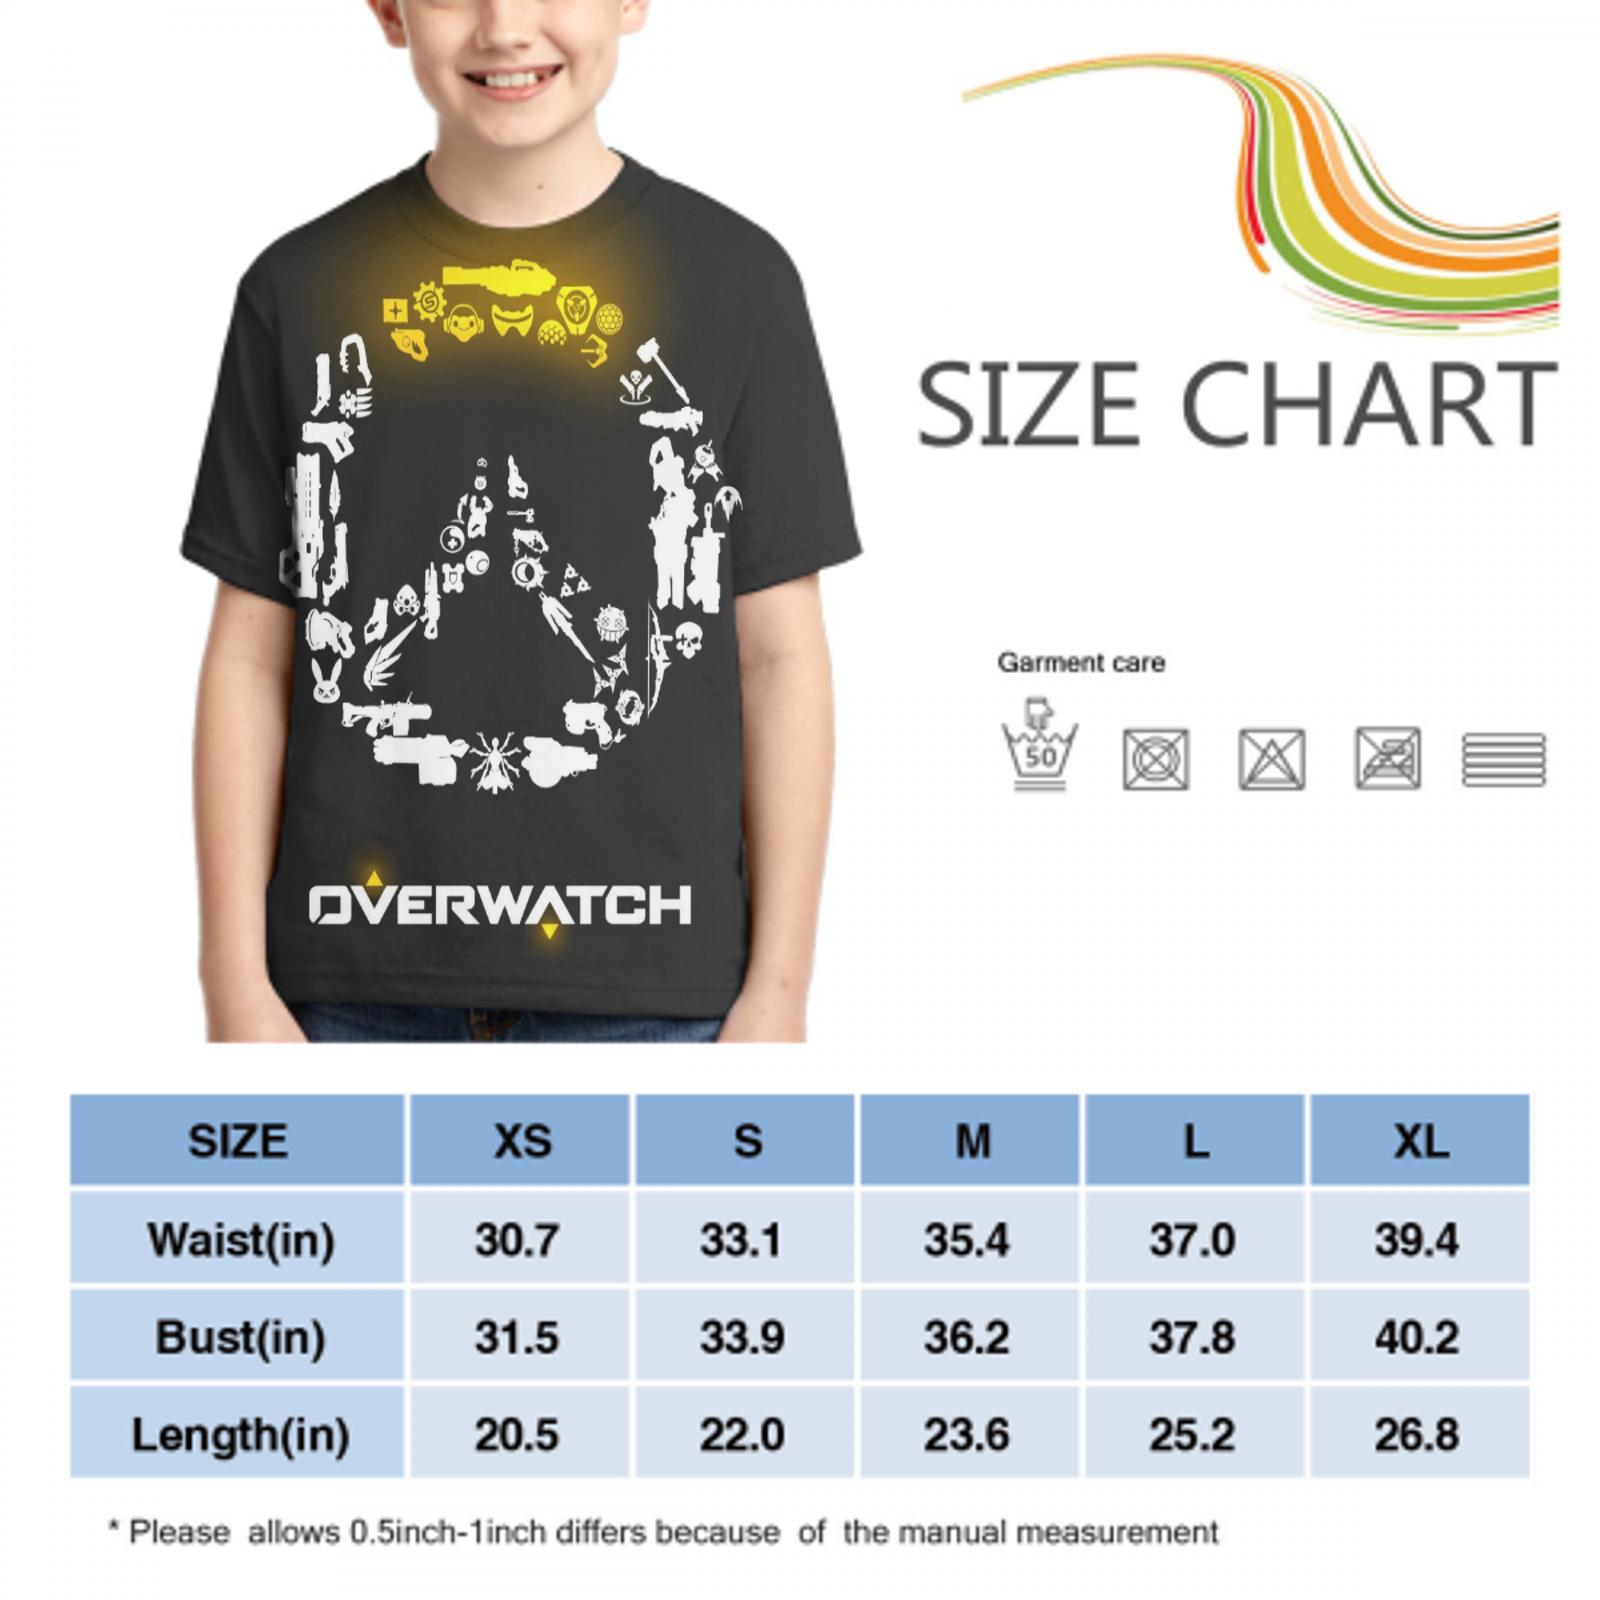 printer overwatch casual t shirt custom ladies/mens oversized t shirt overwatch poster boys/girls t shirt 4